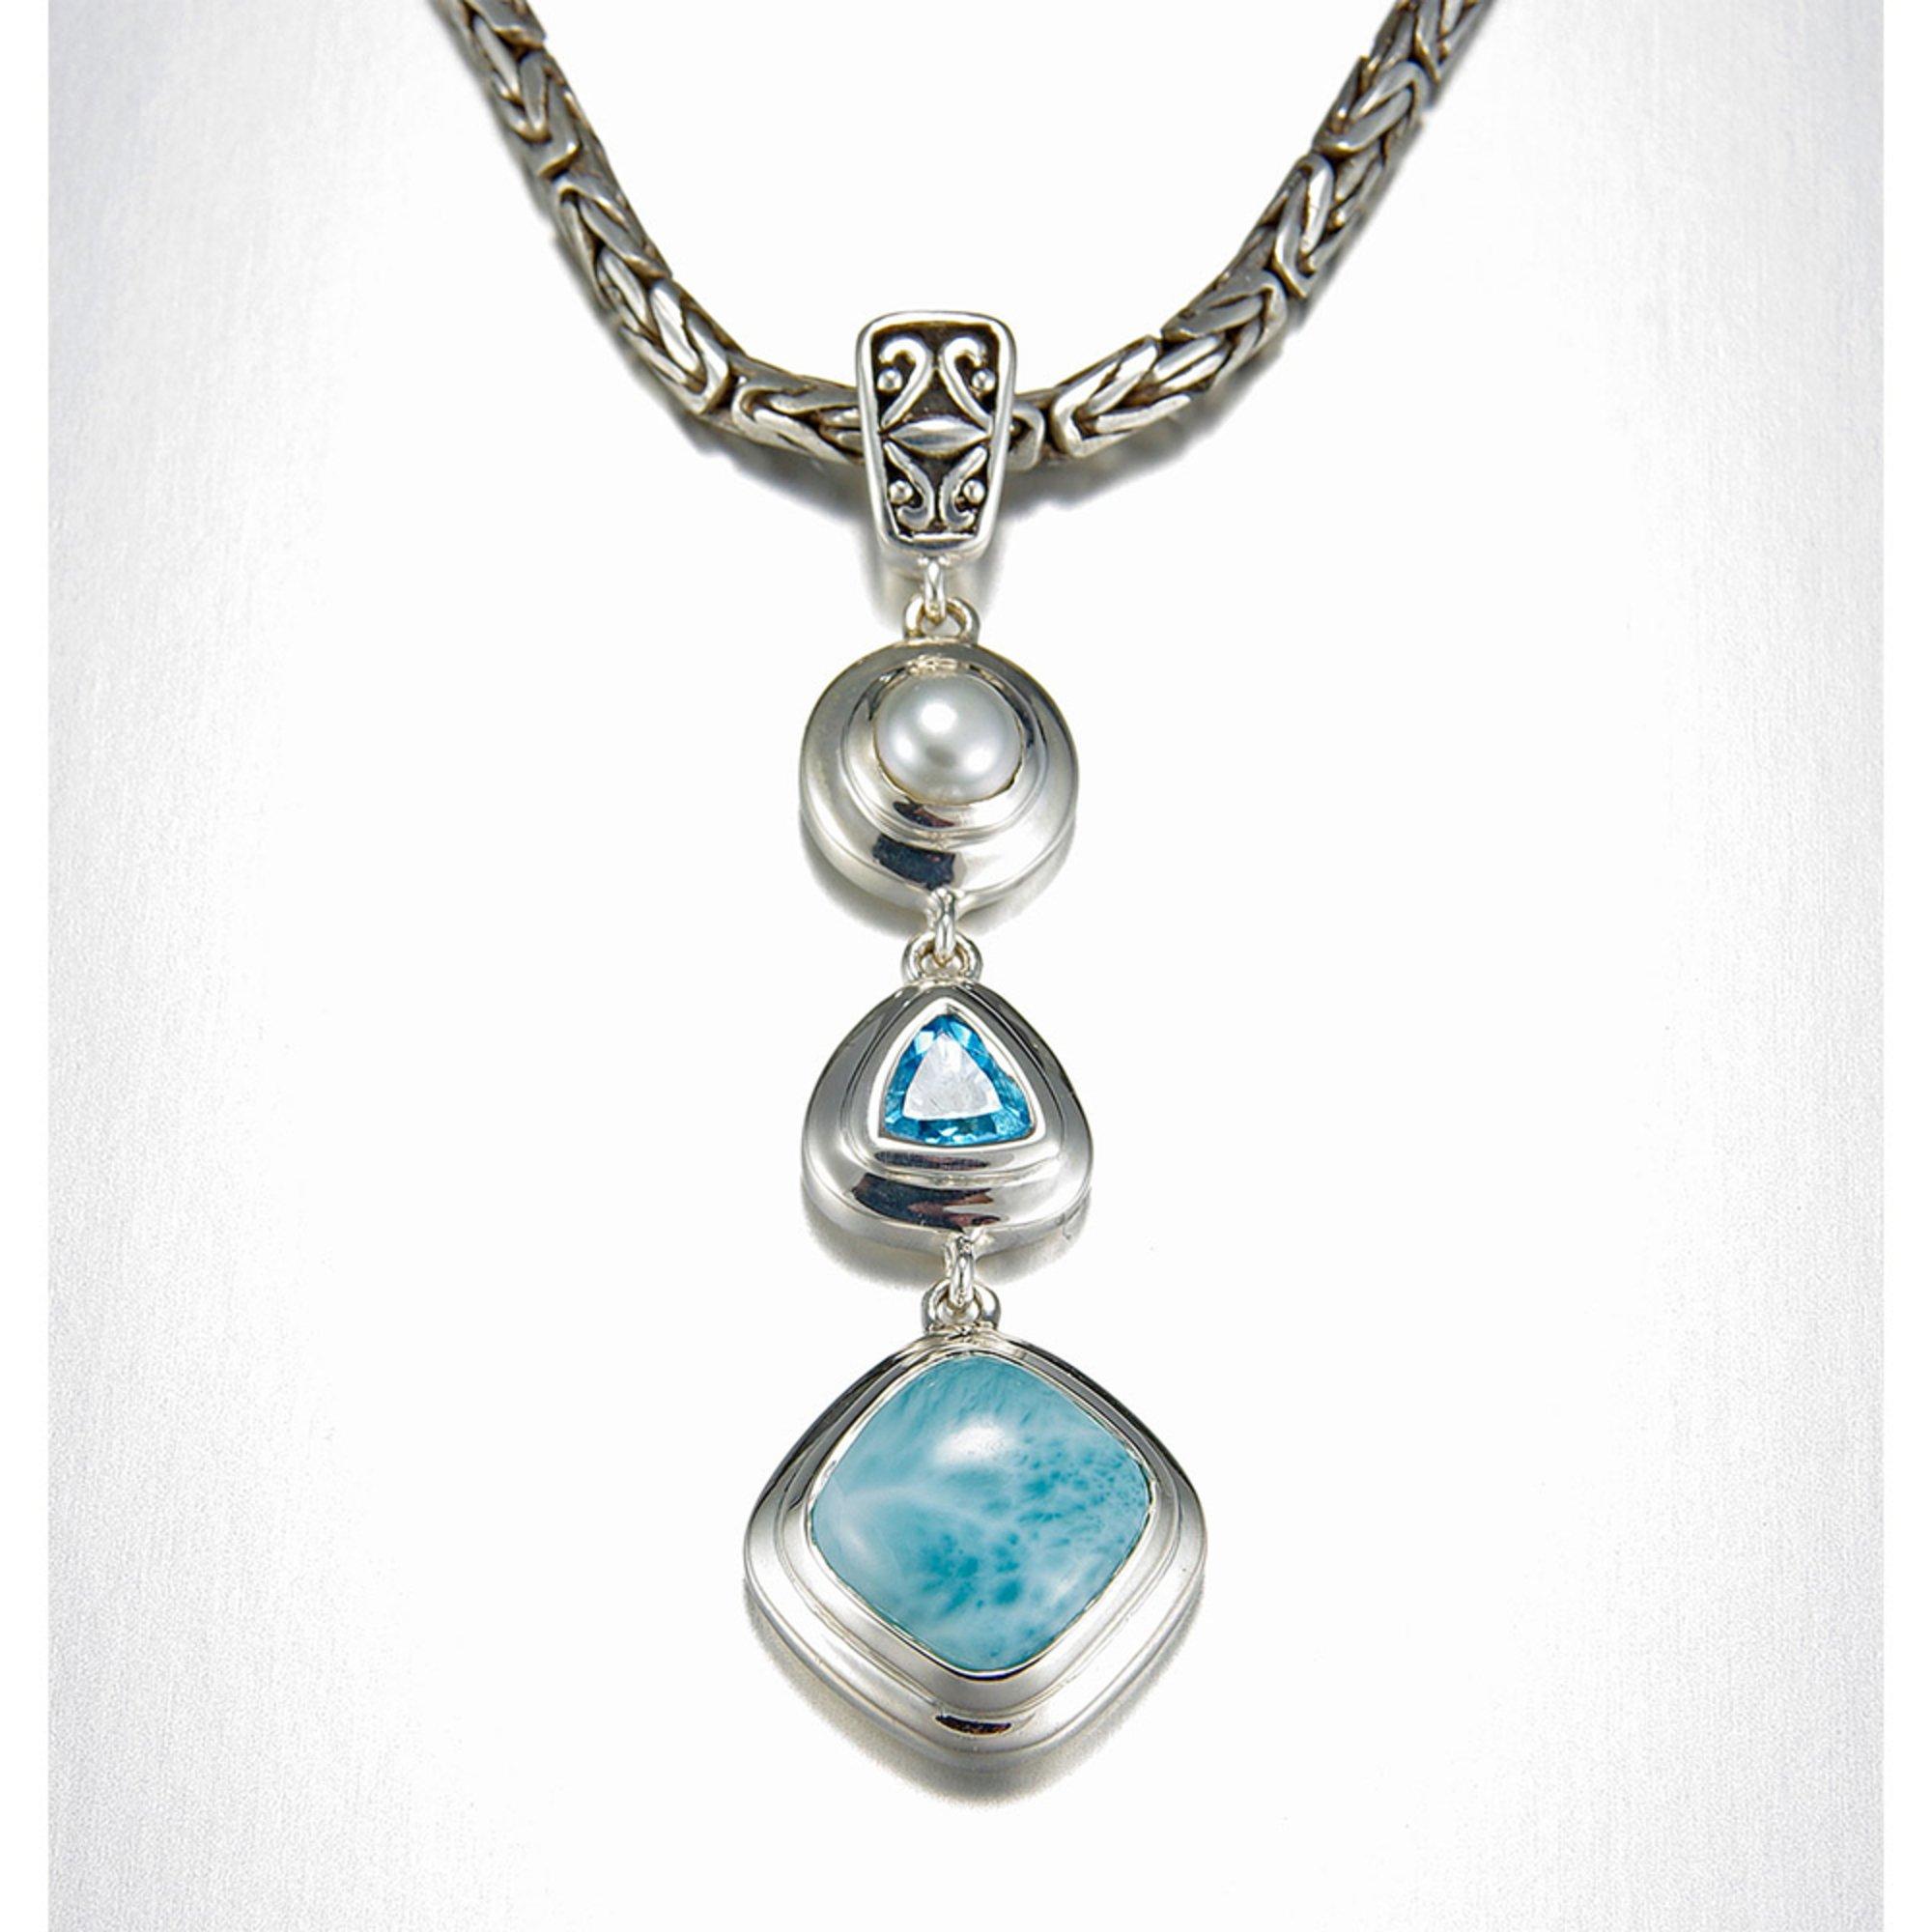 Azzure Silvers: Marahlago Sterling Silver Larimar Azure Necklace